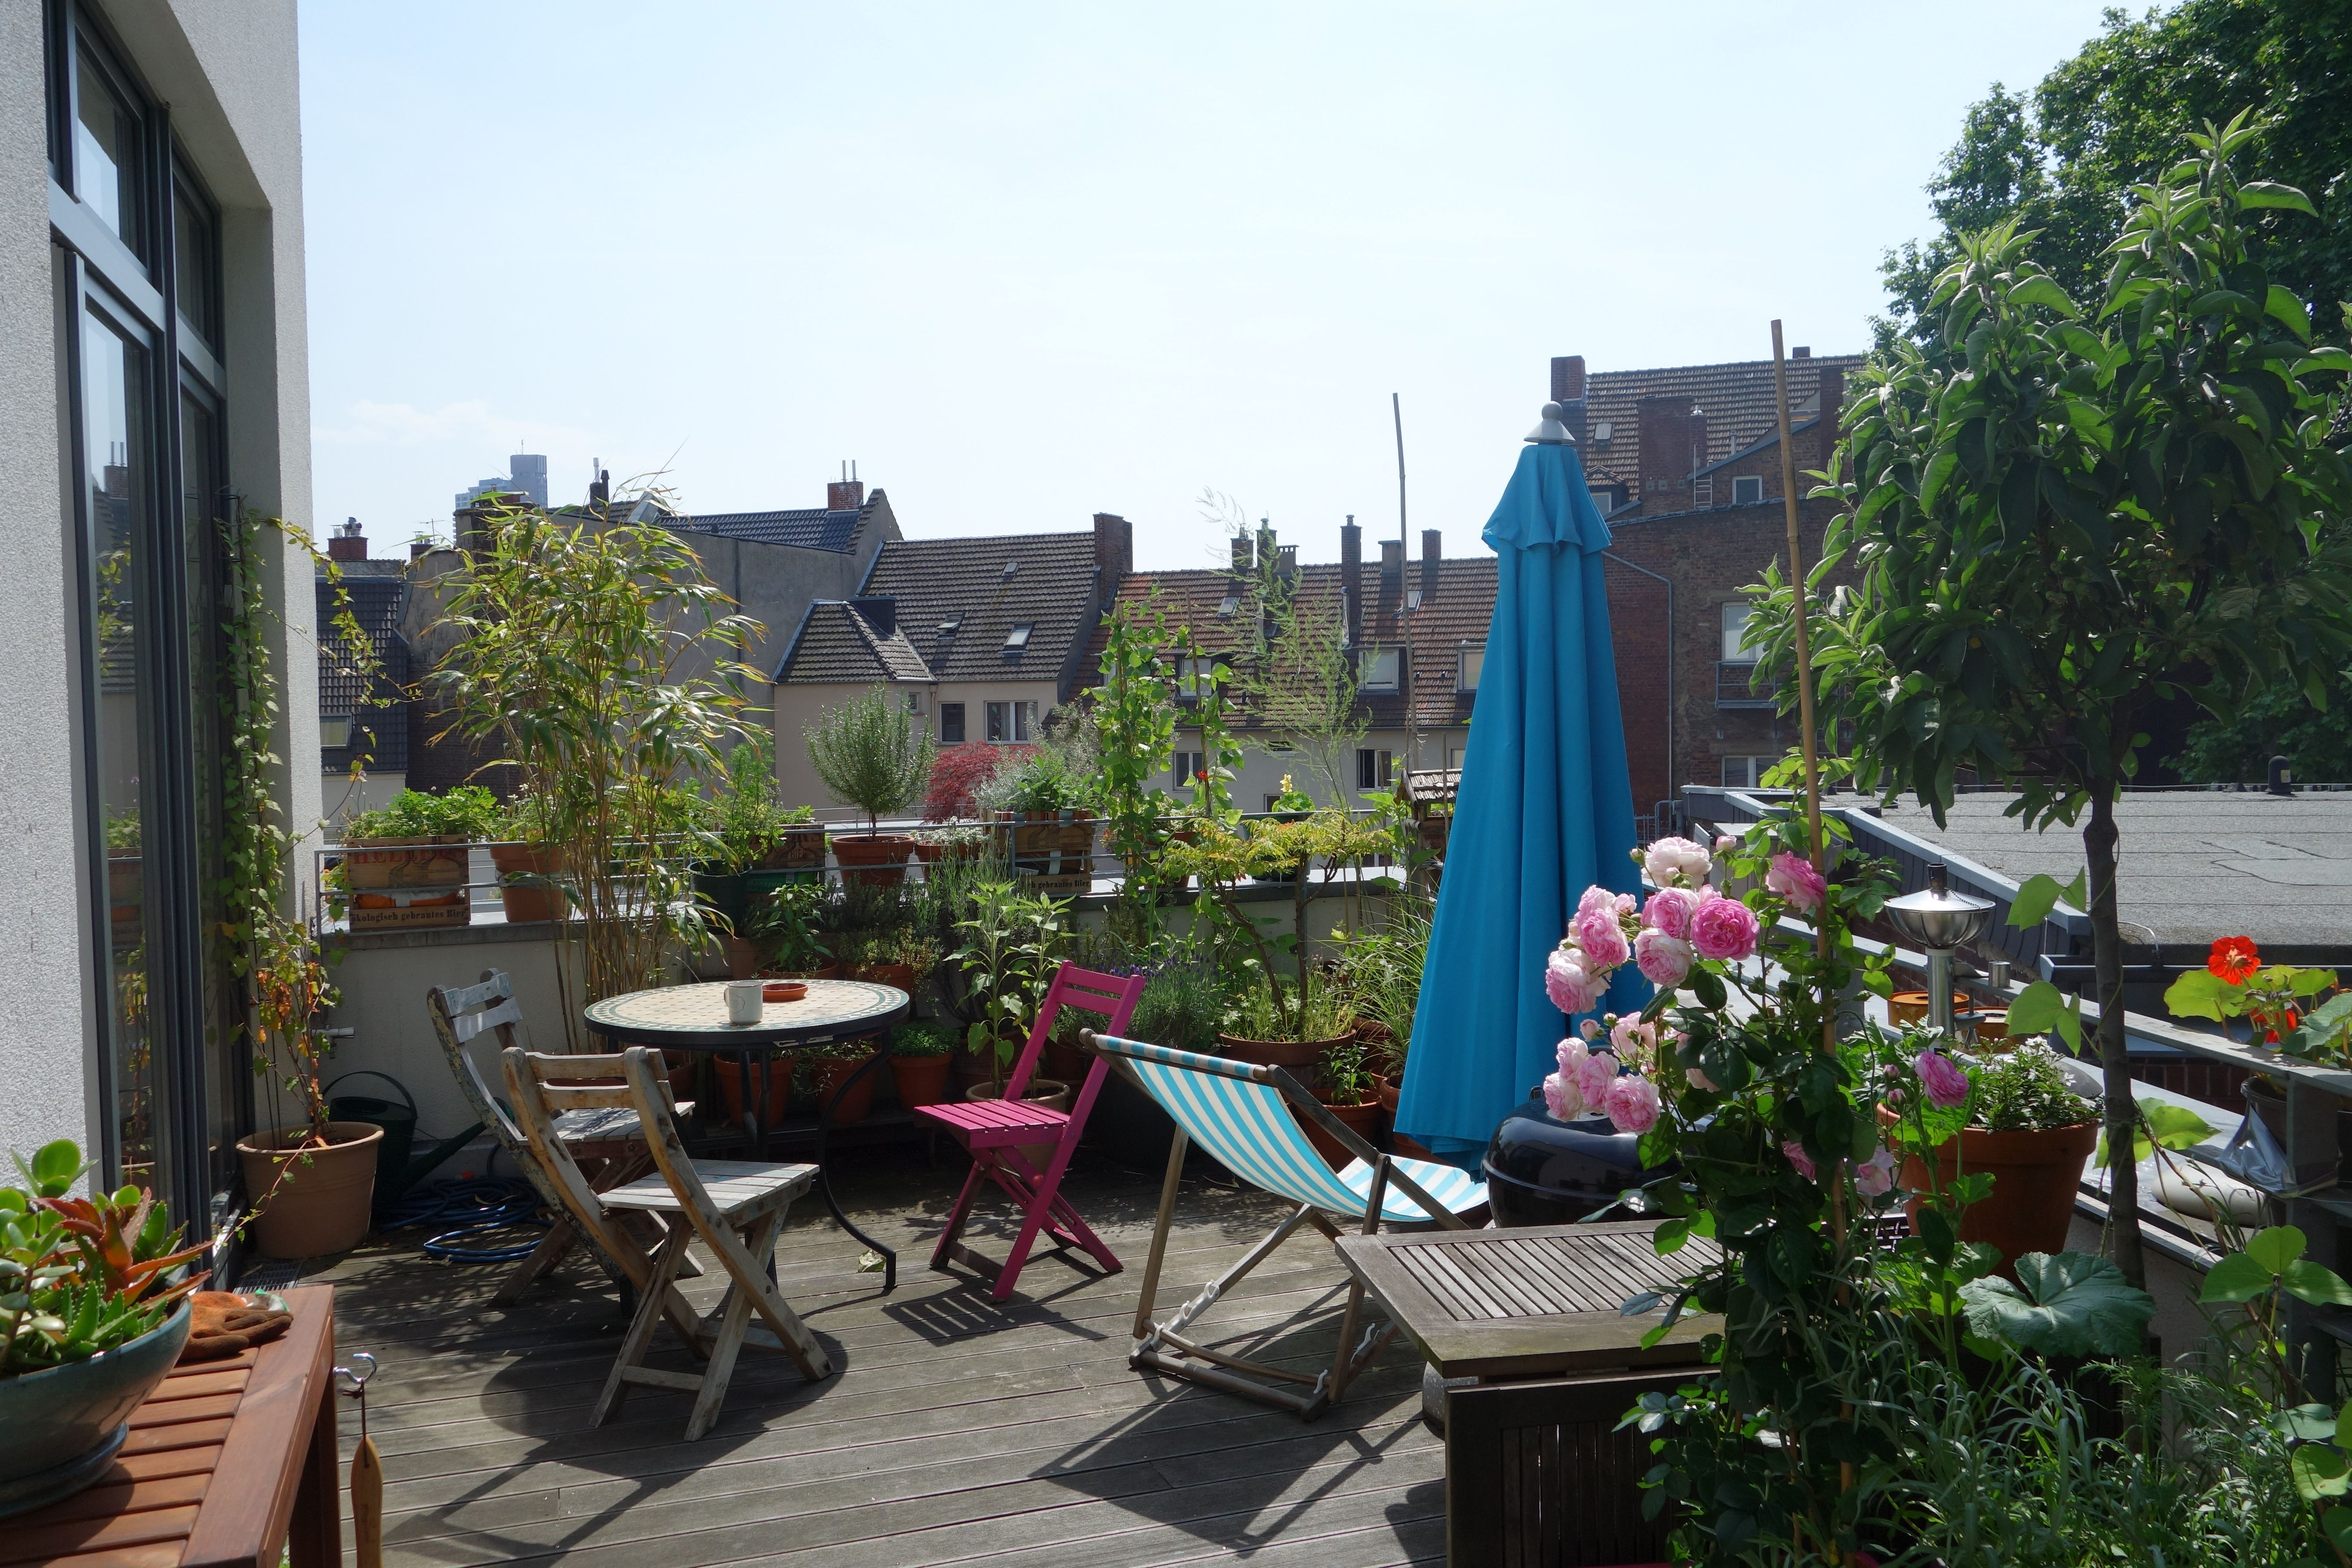 Dachterrasse, Balkon, Begrünung | Gardening Ideas | Pinterest ...